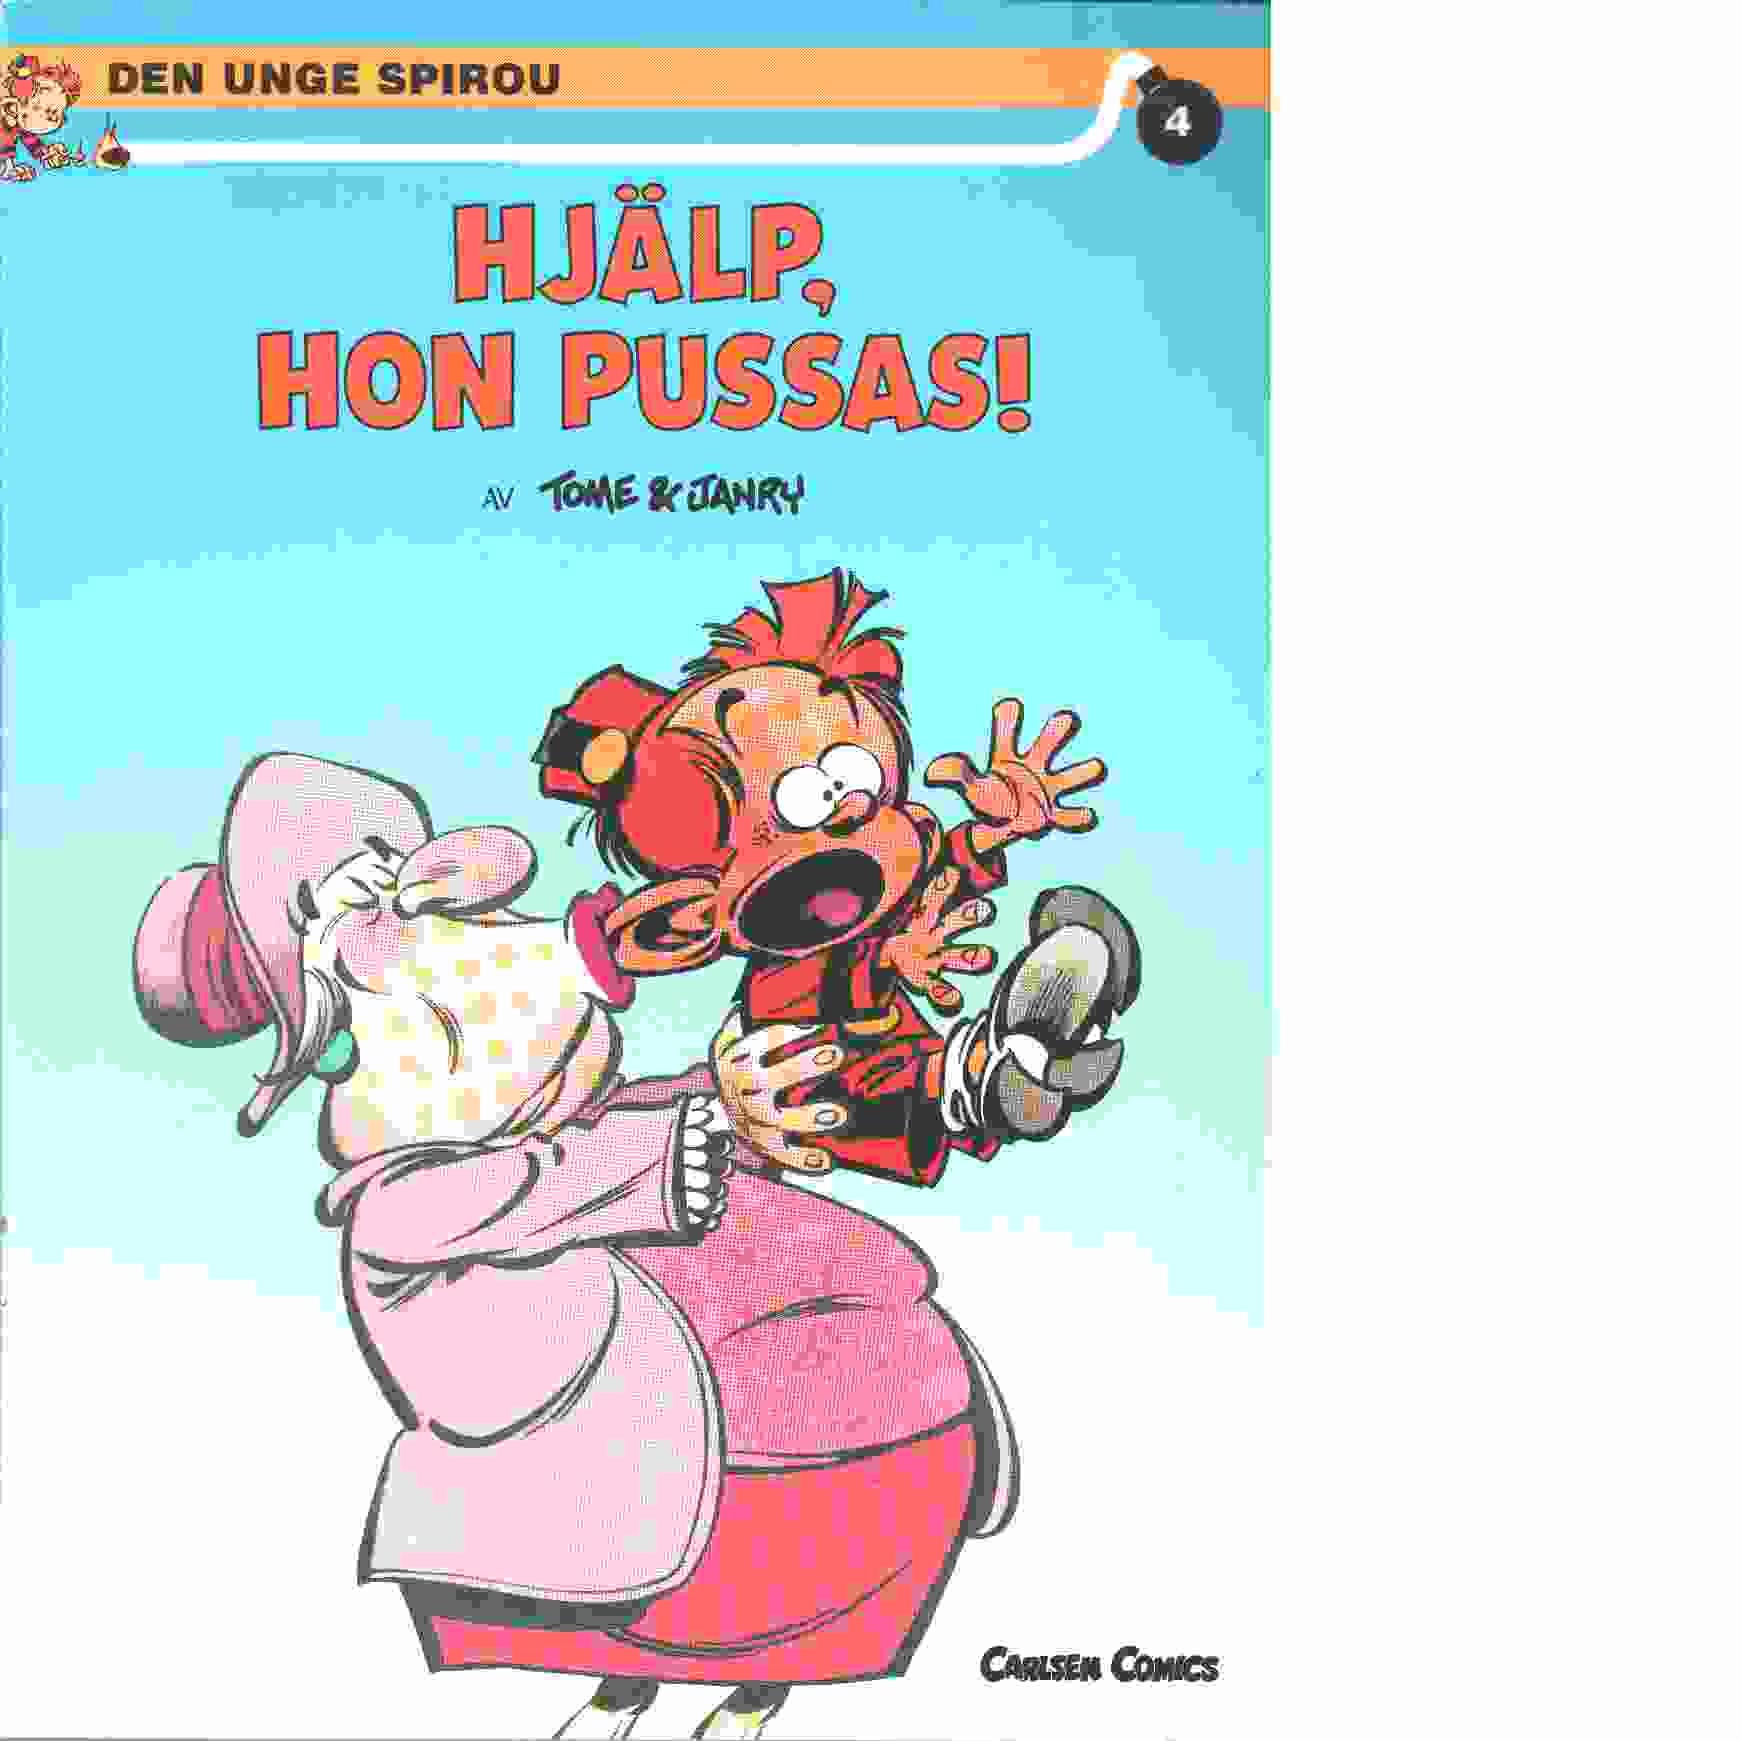 Den unge Spirou 4 : Hjälp, hon pussas! - Tome och Janry